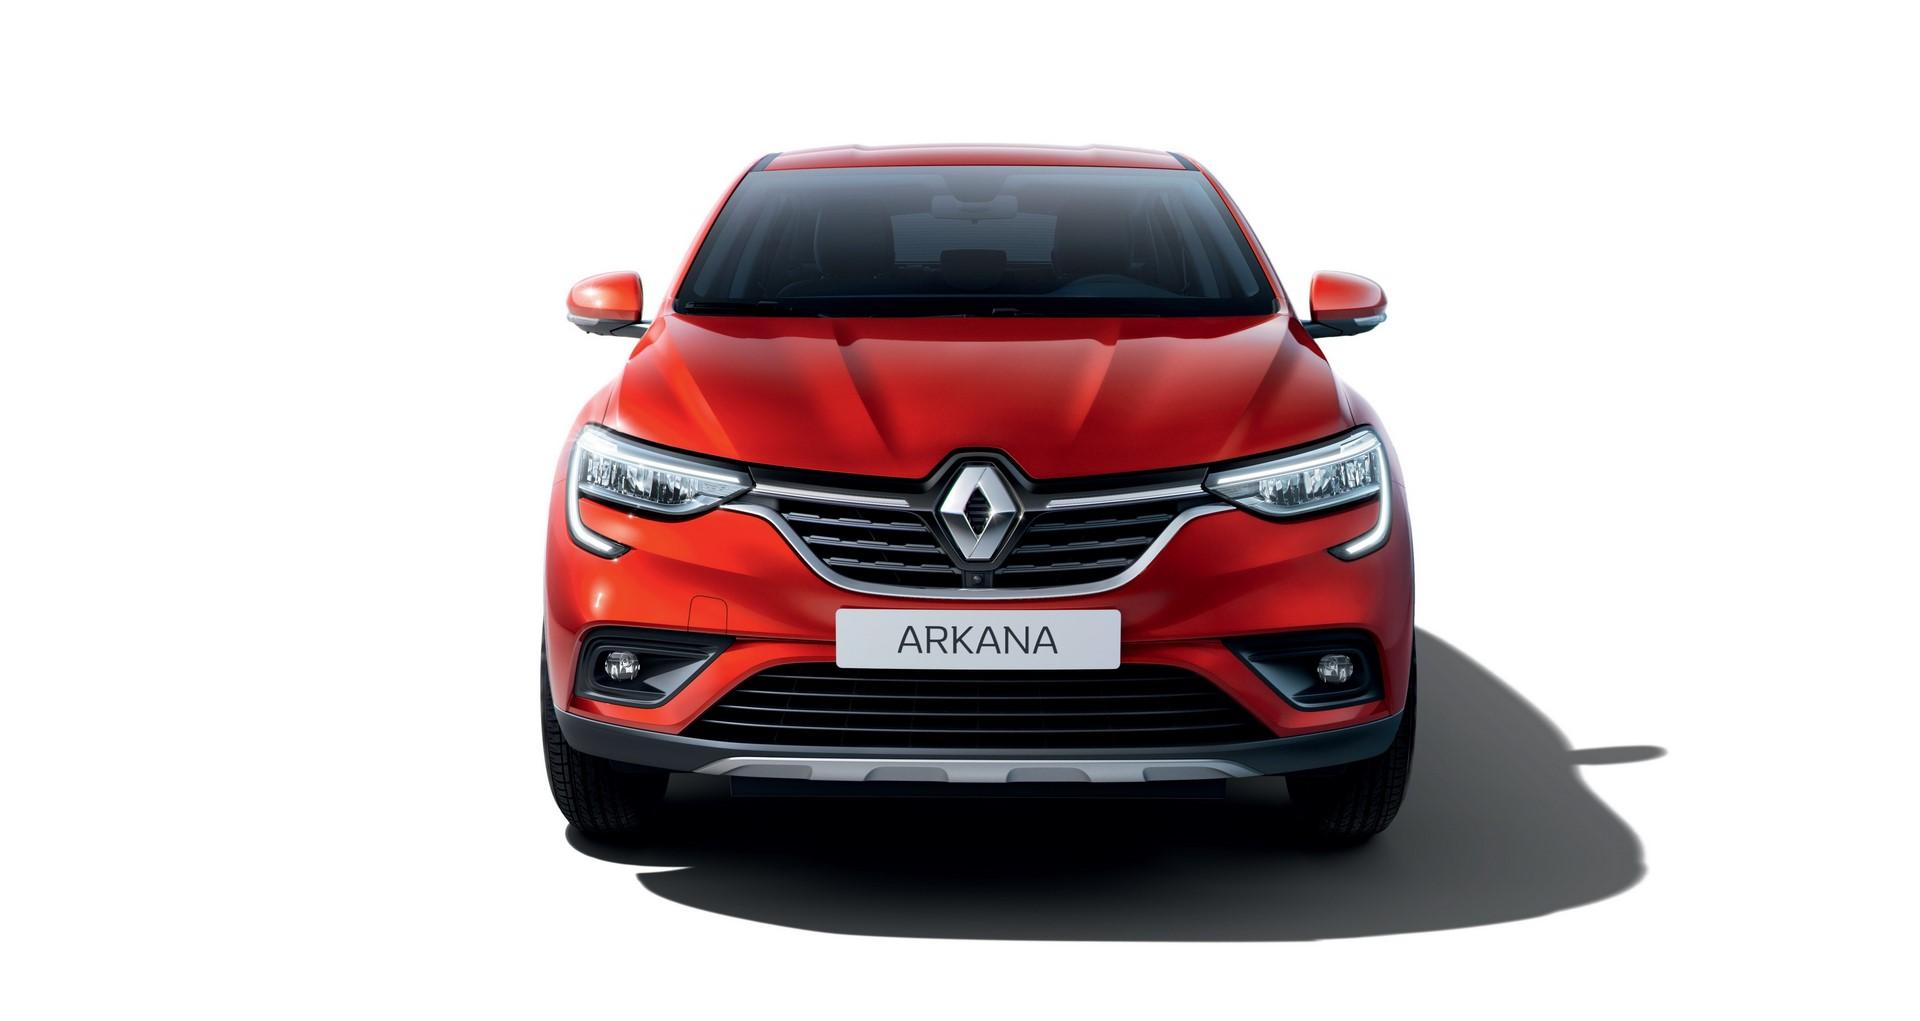 2019 - Renault ARKANA